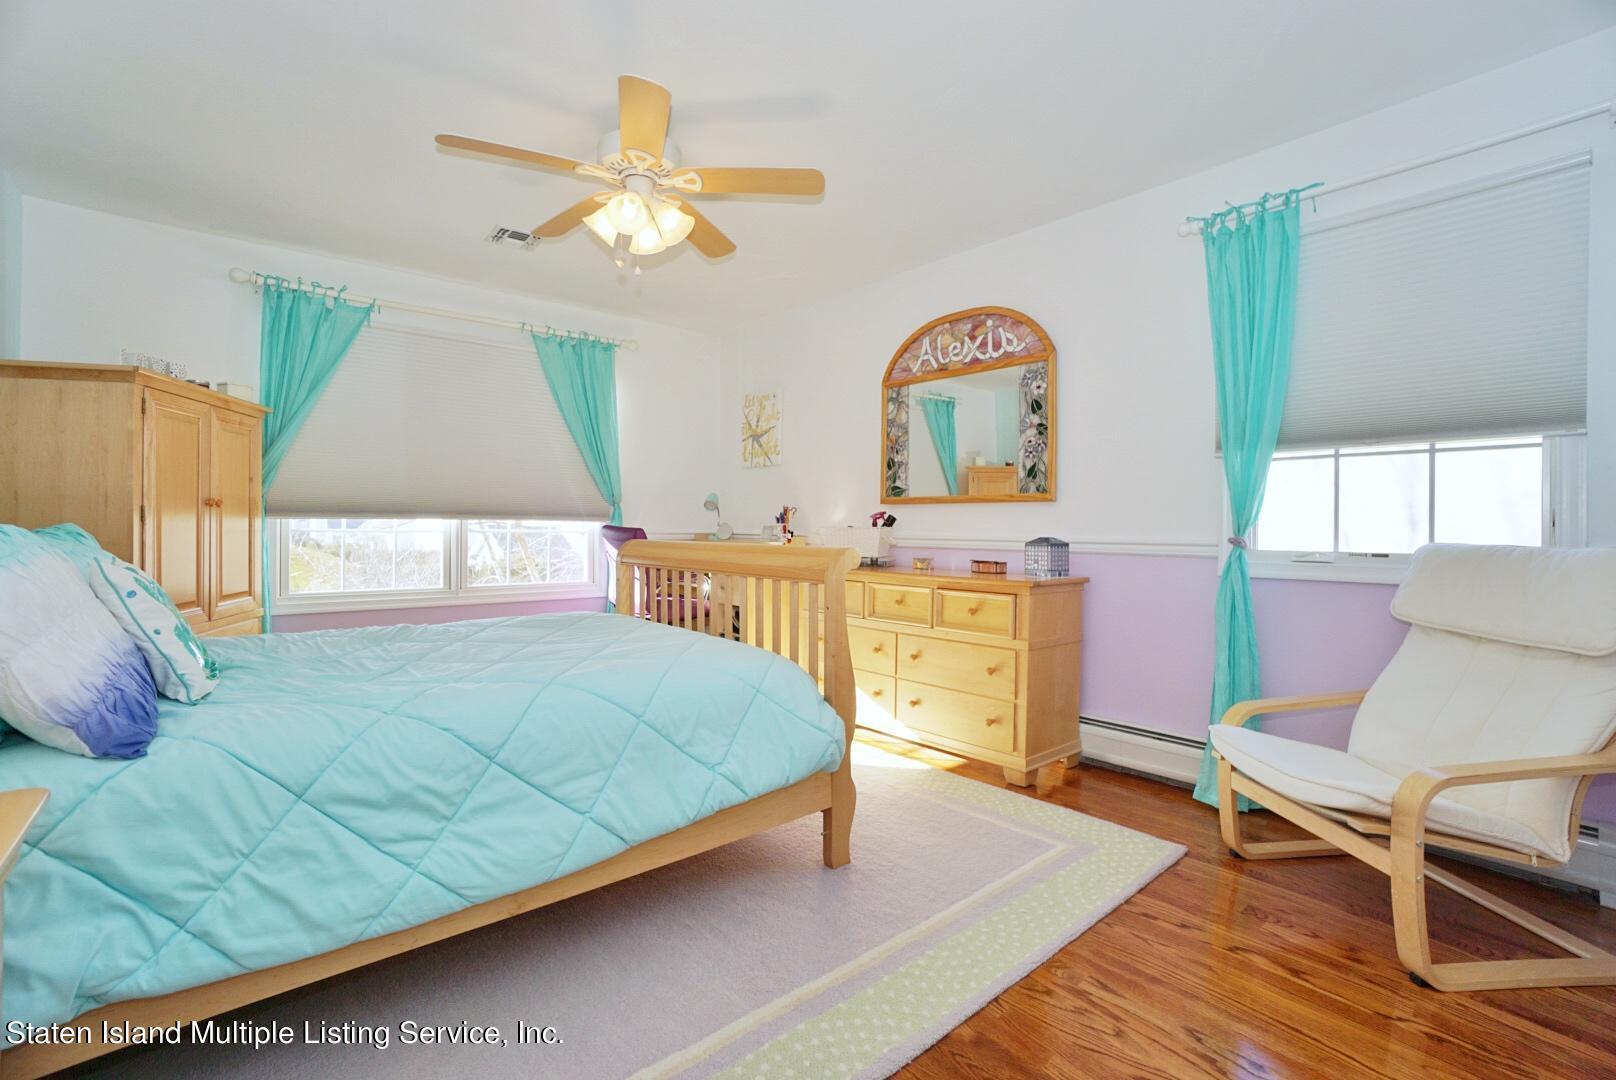 Single Family - Detached 31 Belwood Loop  Staten Island, NY 10307, MLS-1143133-43